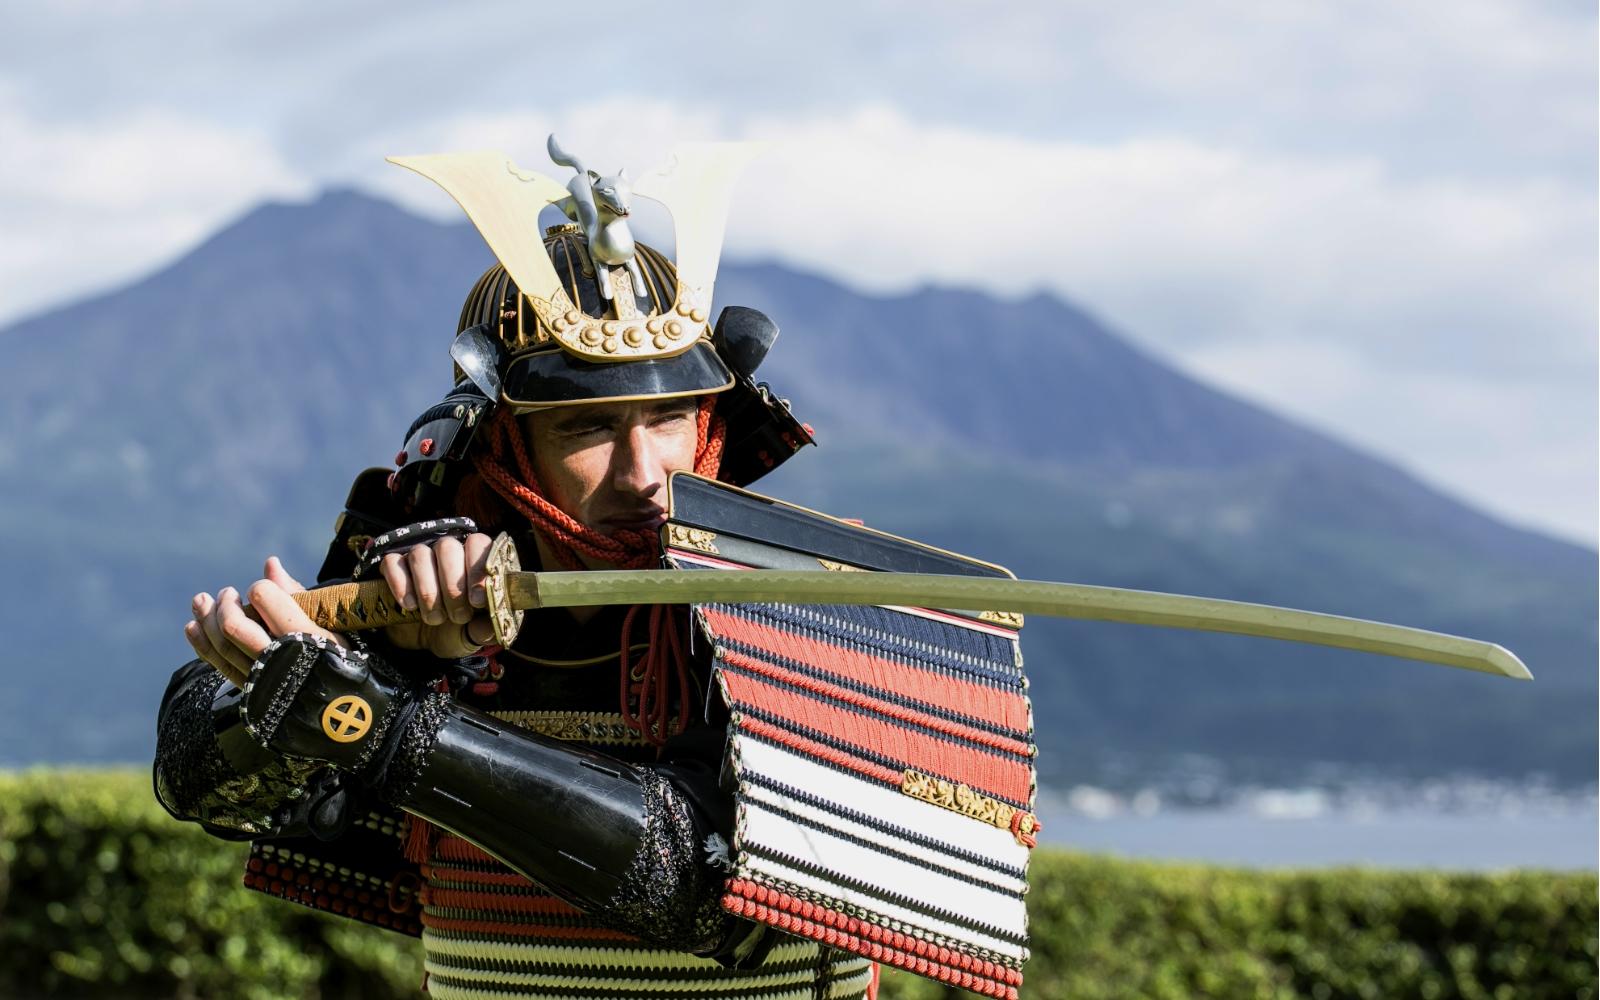 Samurai armor experience at Sengan-en.jpg